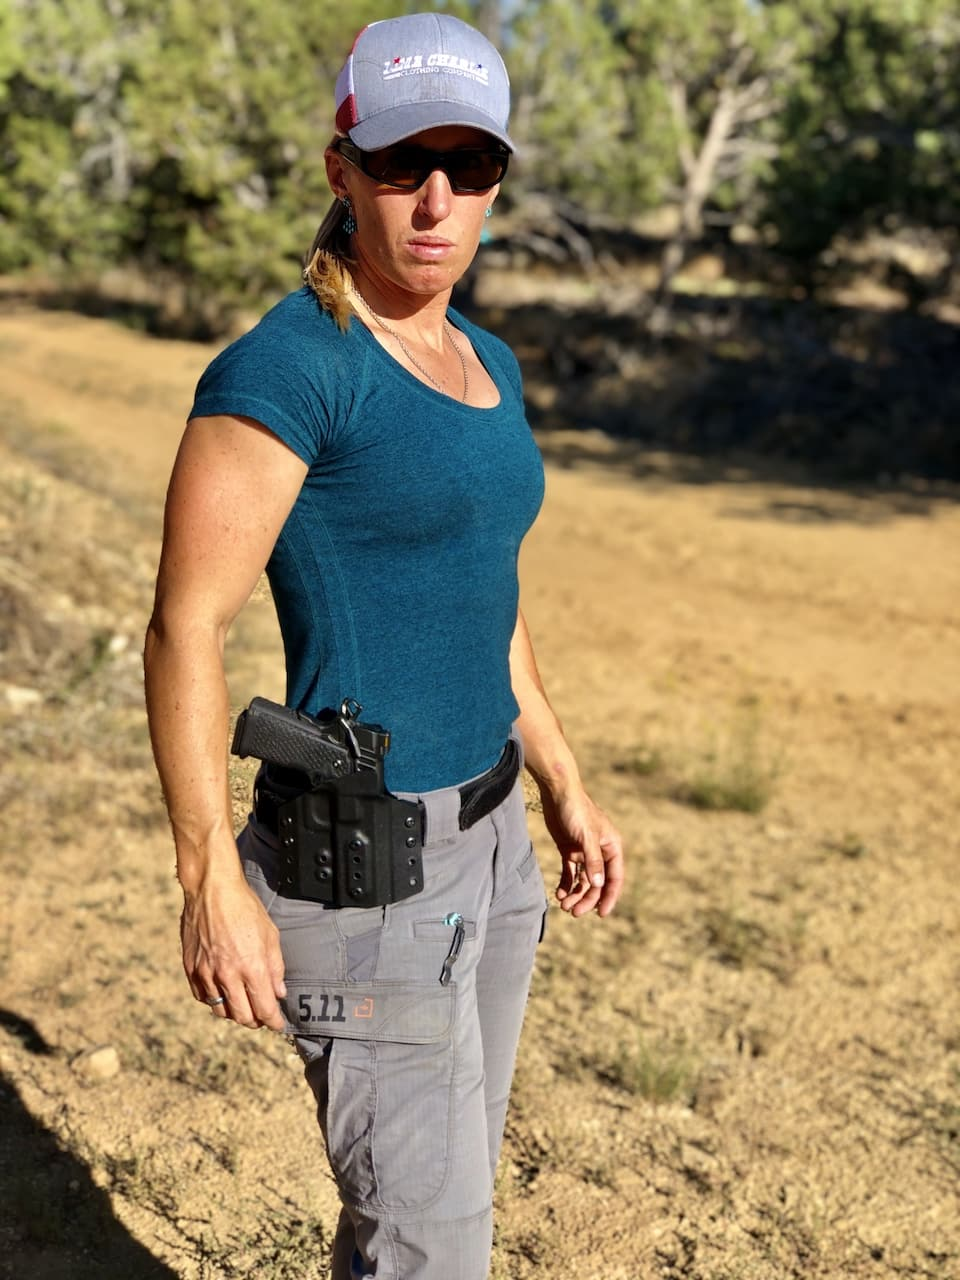 Lanny Barnes carrying handgun